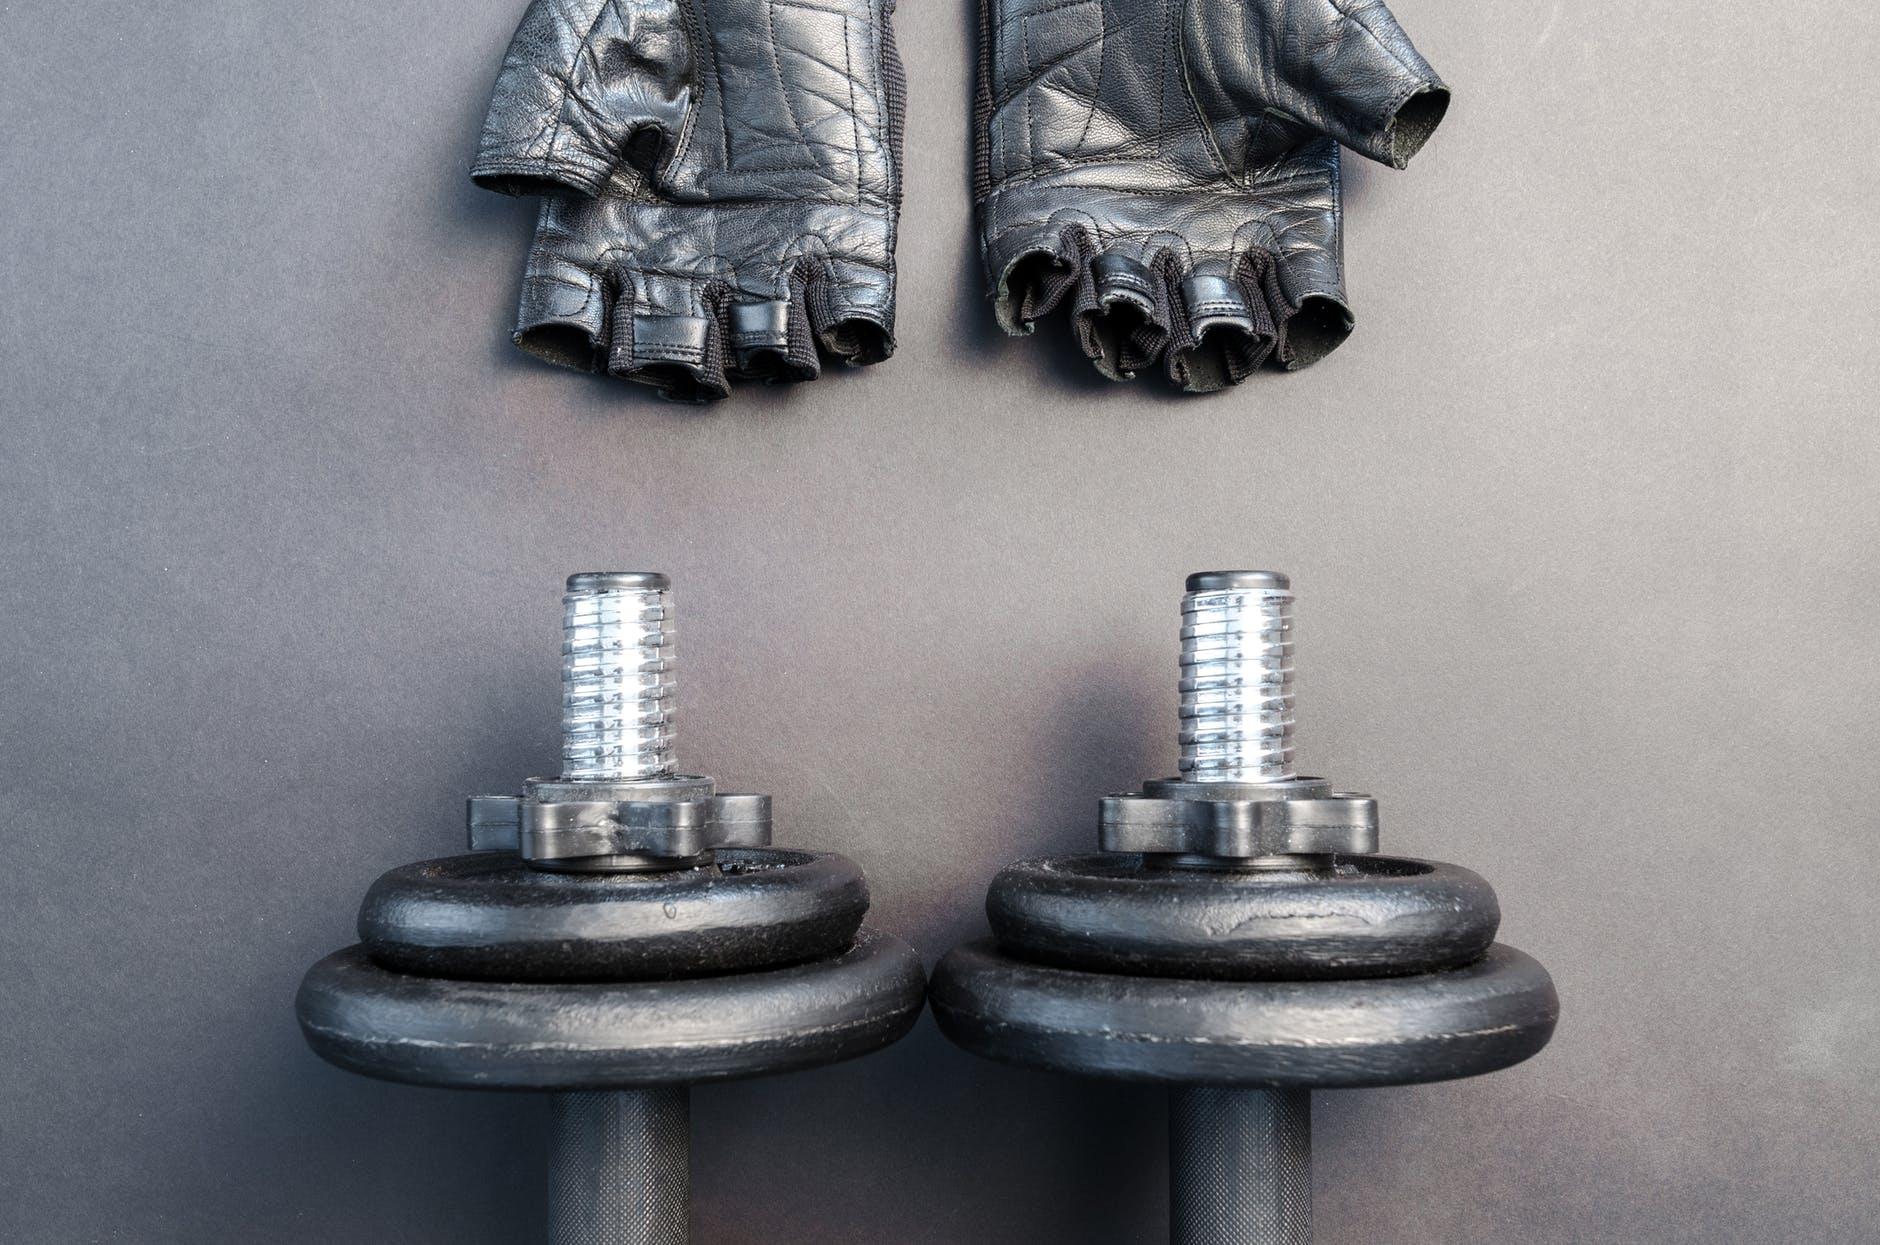 pair of fingerless gloves and adjustable dumbbells